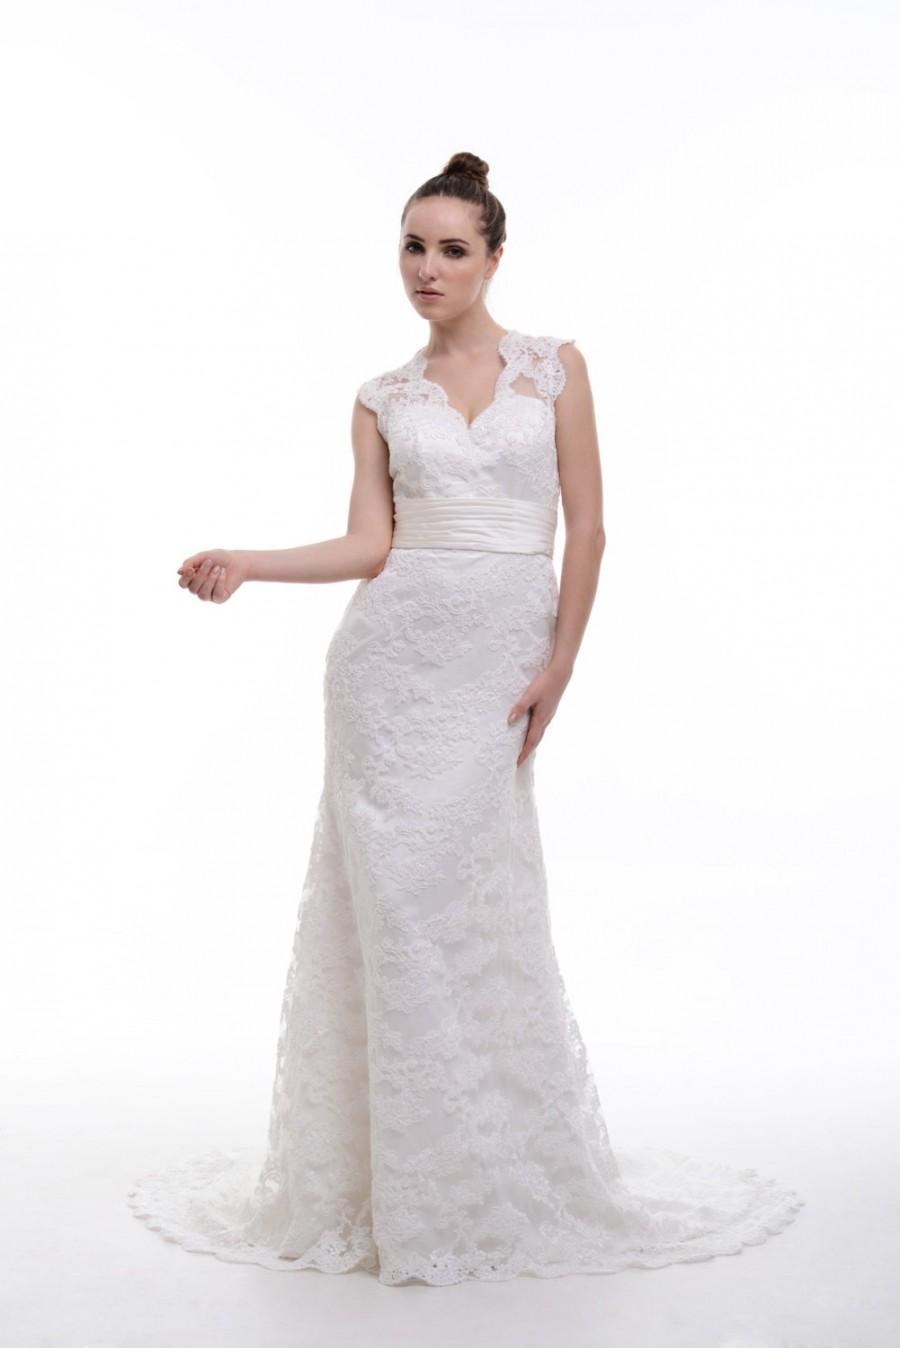 Wedding - V-neck Floor-Length Lace Wedding Dress With Scalloped Edge